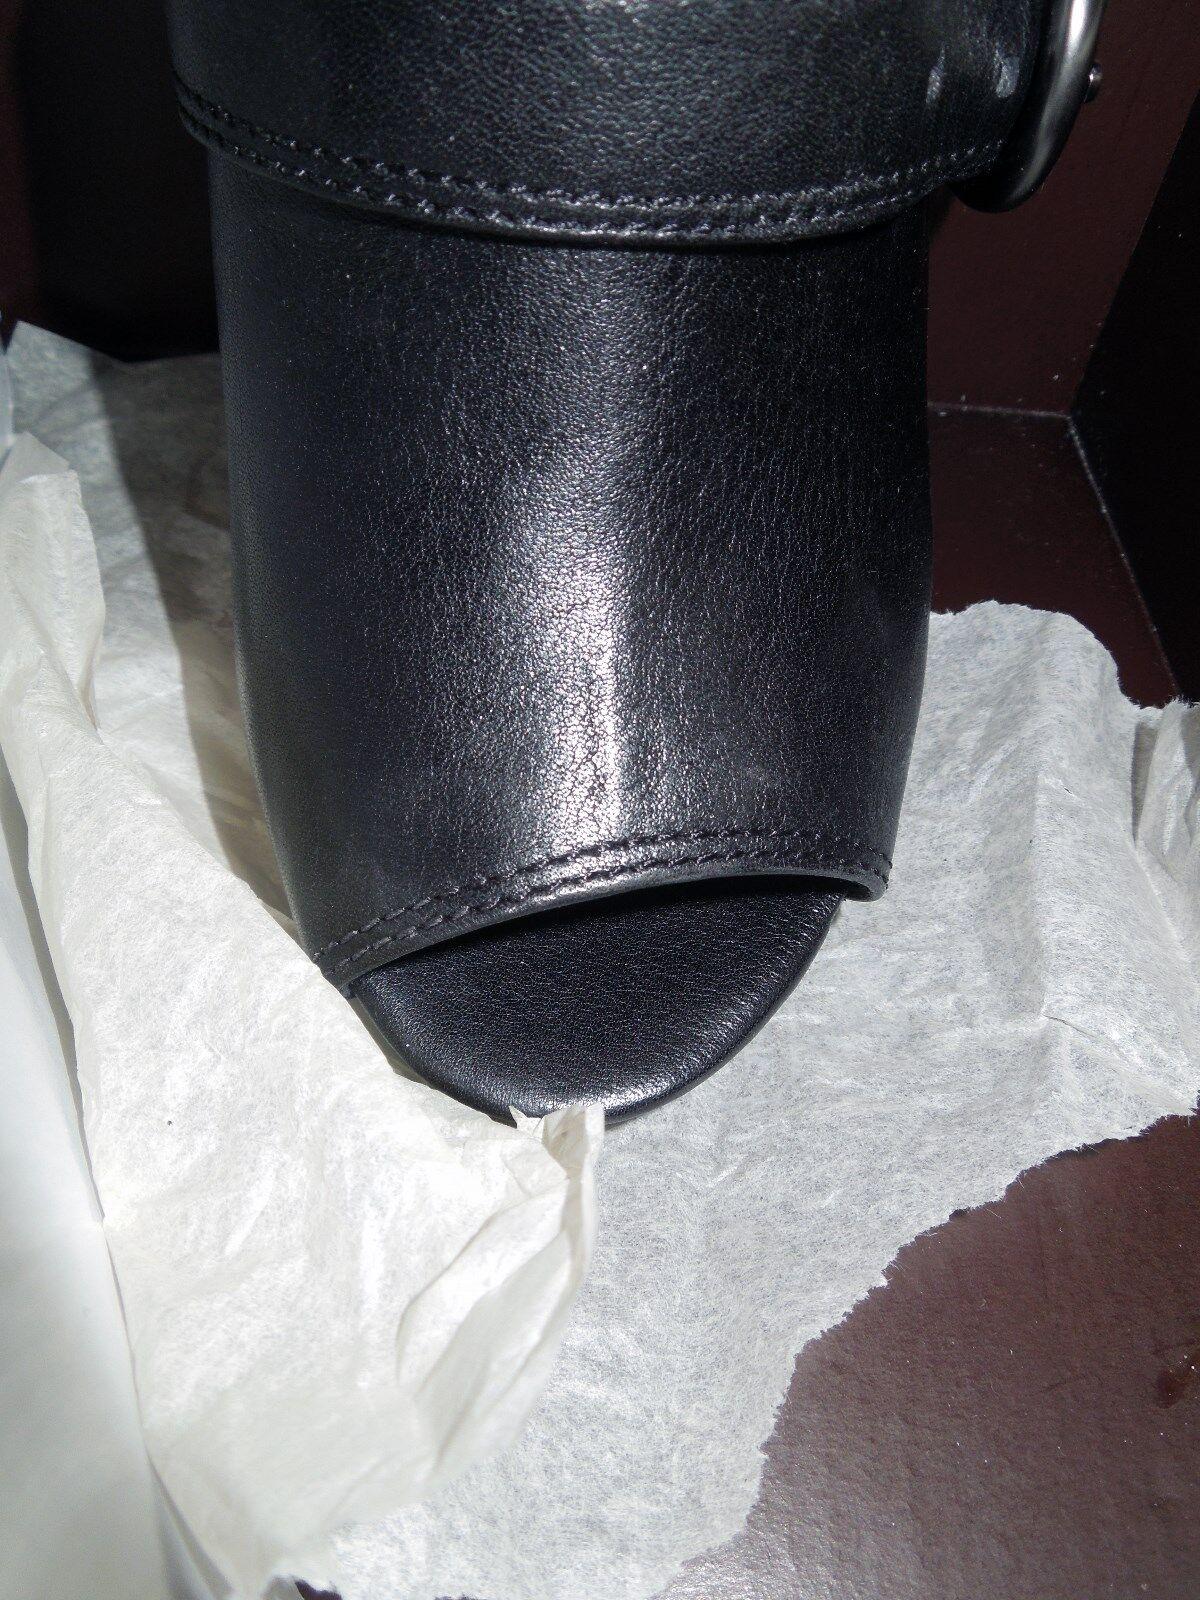 Plumín ENTRENADOR q643 Alexia Cuero Negro Peep Toe Plataforma Plataforma Plataforma Stiletto Botines 7.5 M b7a07b